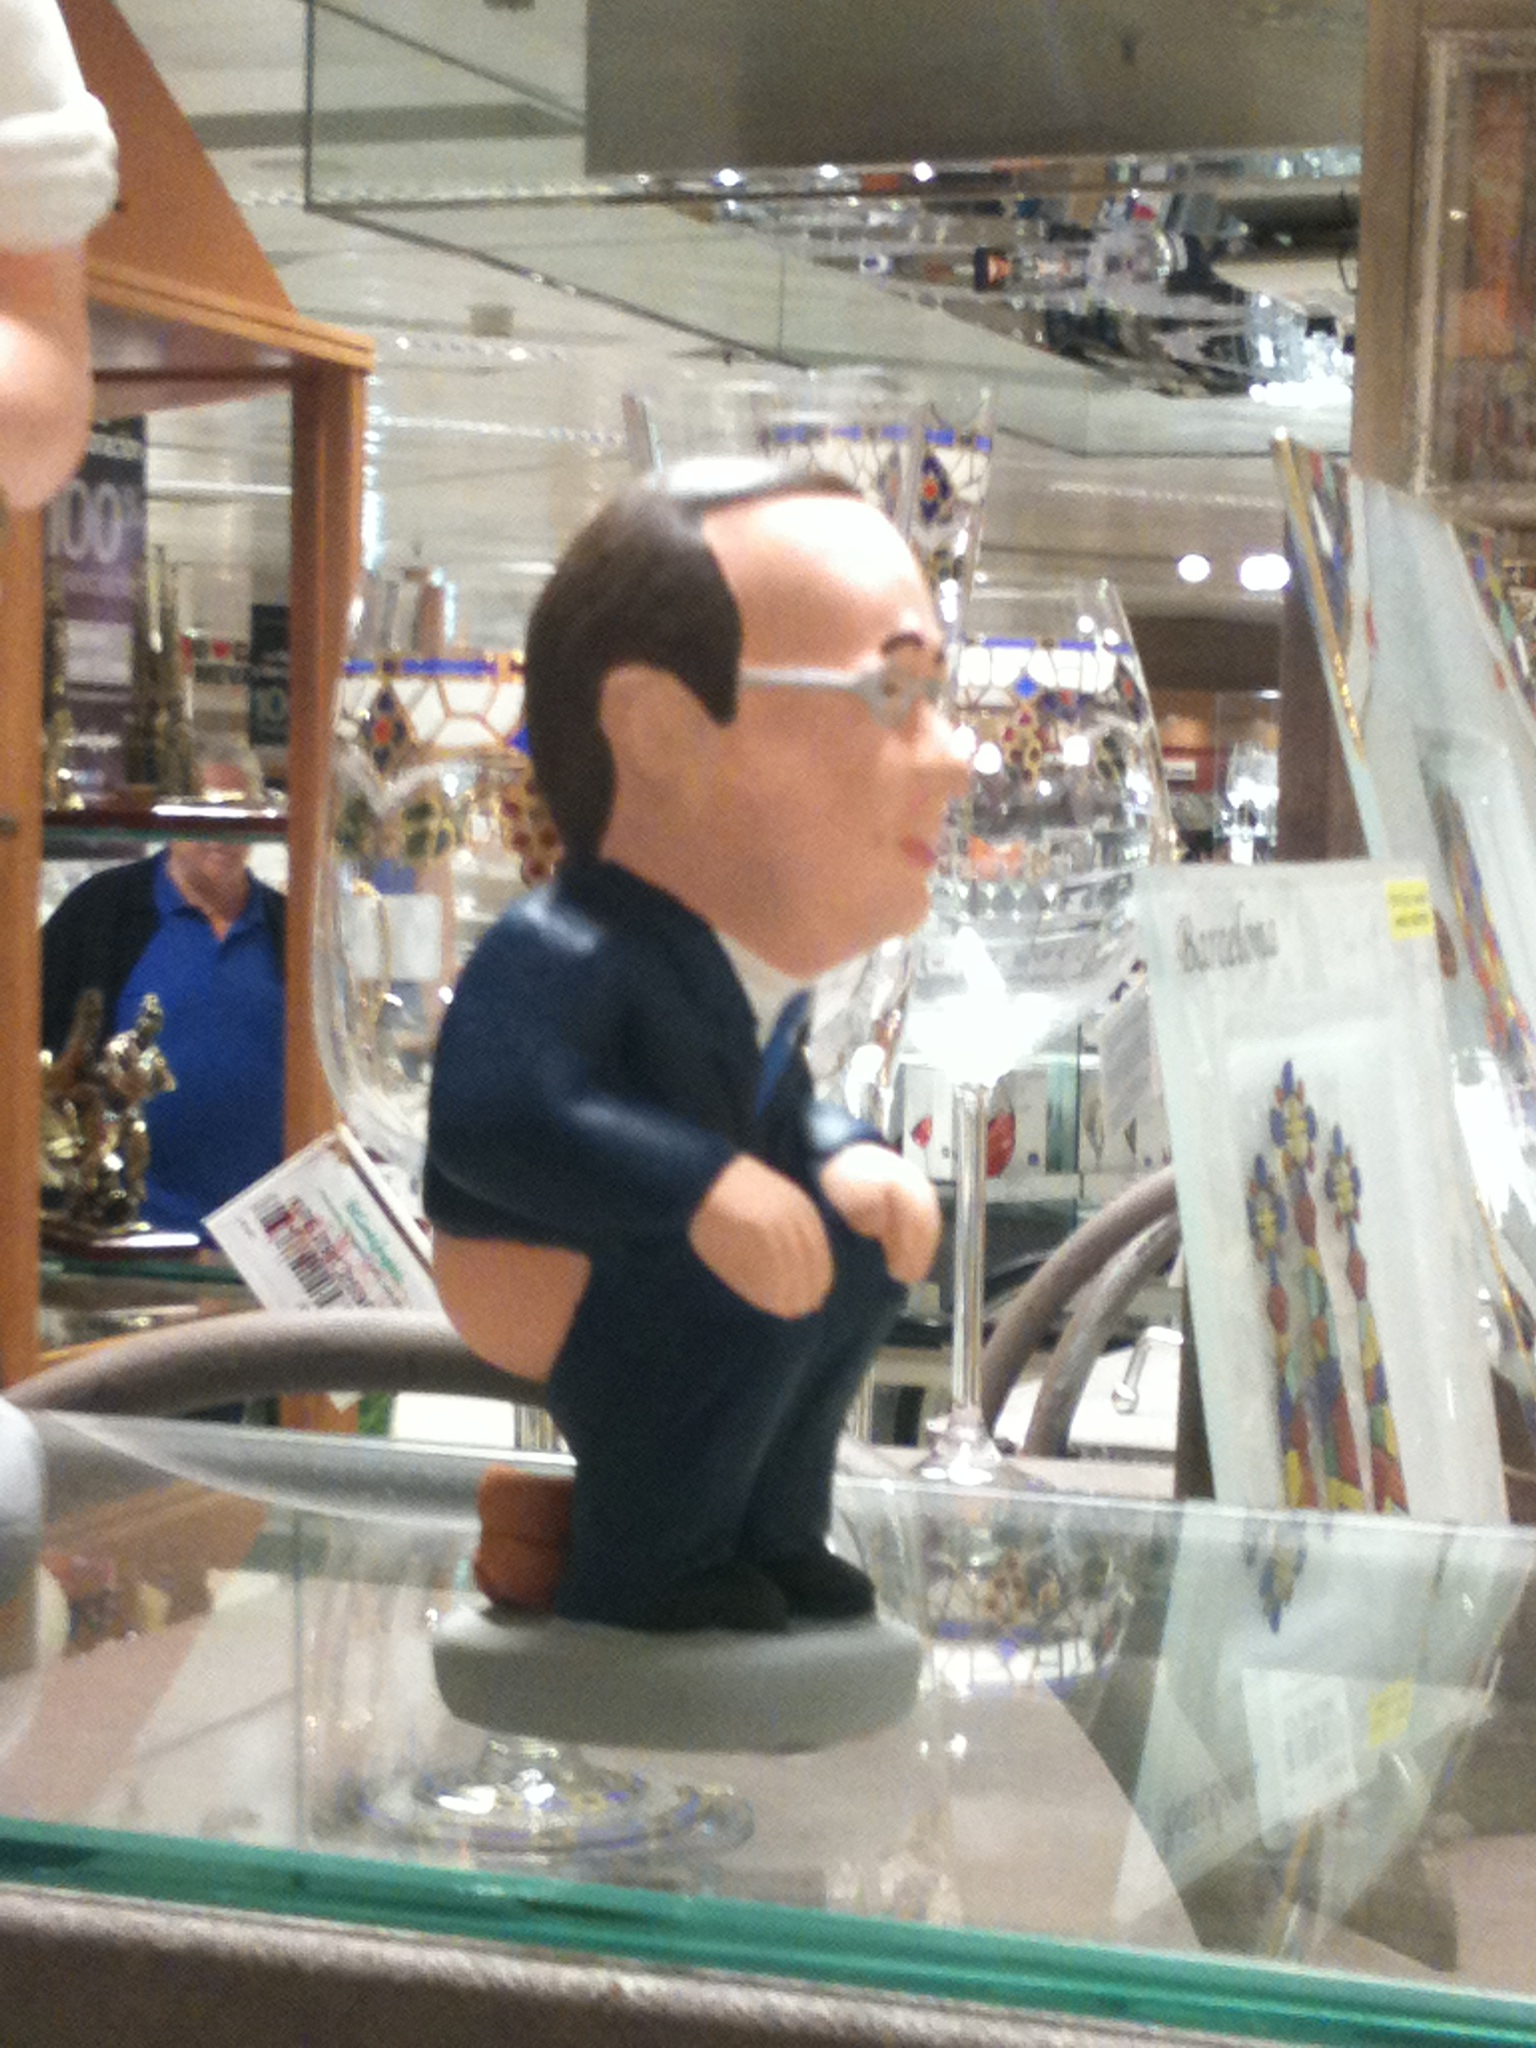 François Hollande en pleine action